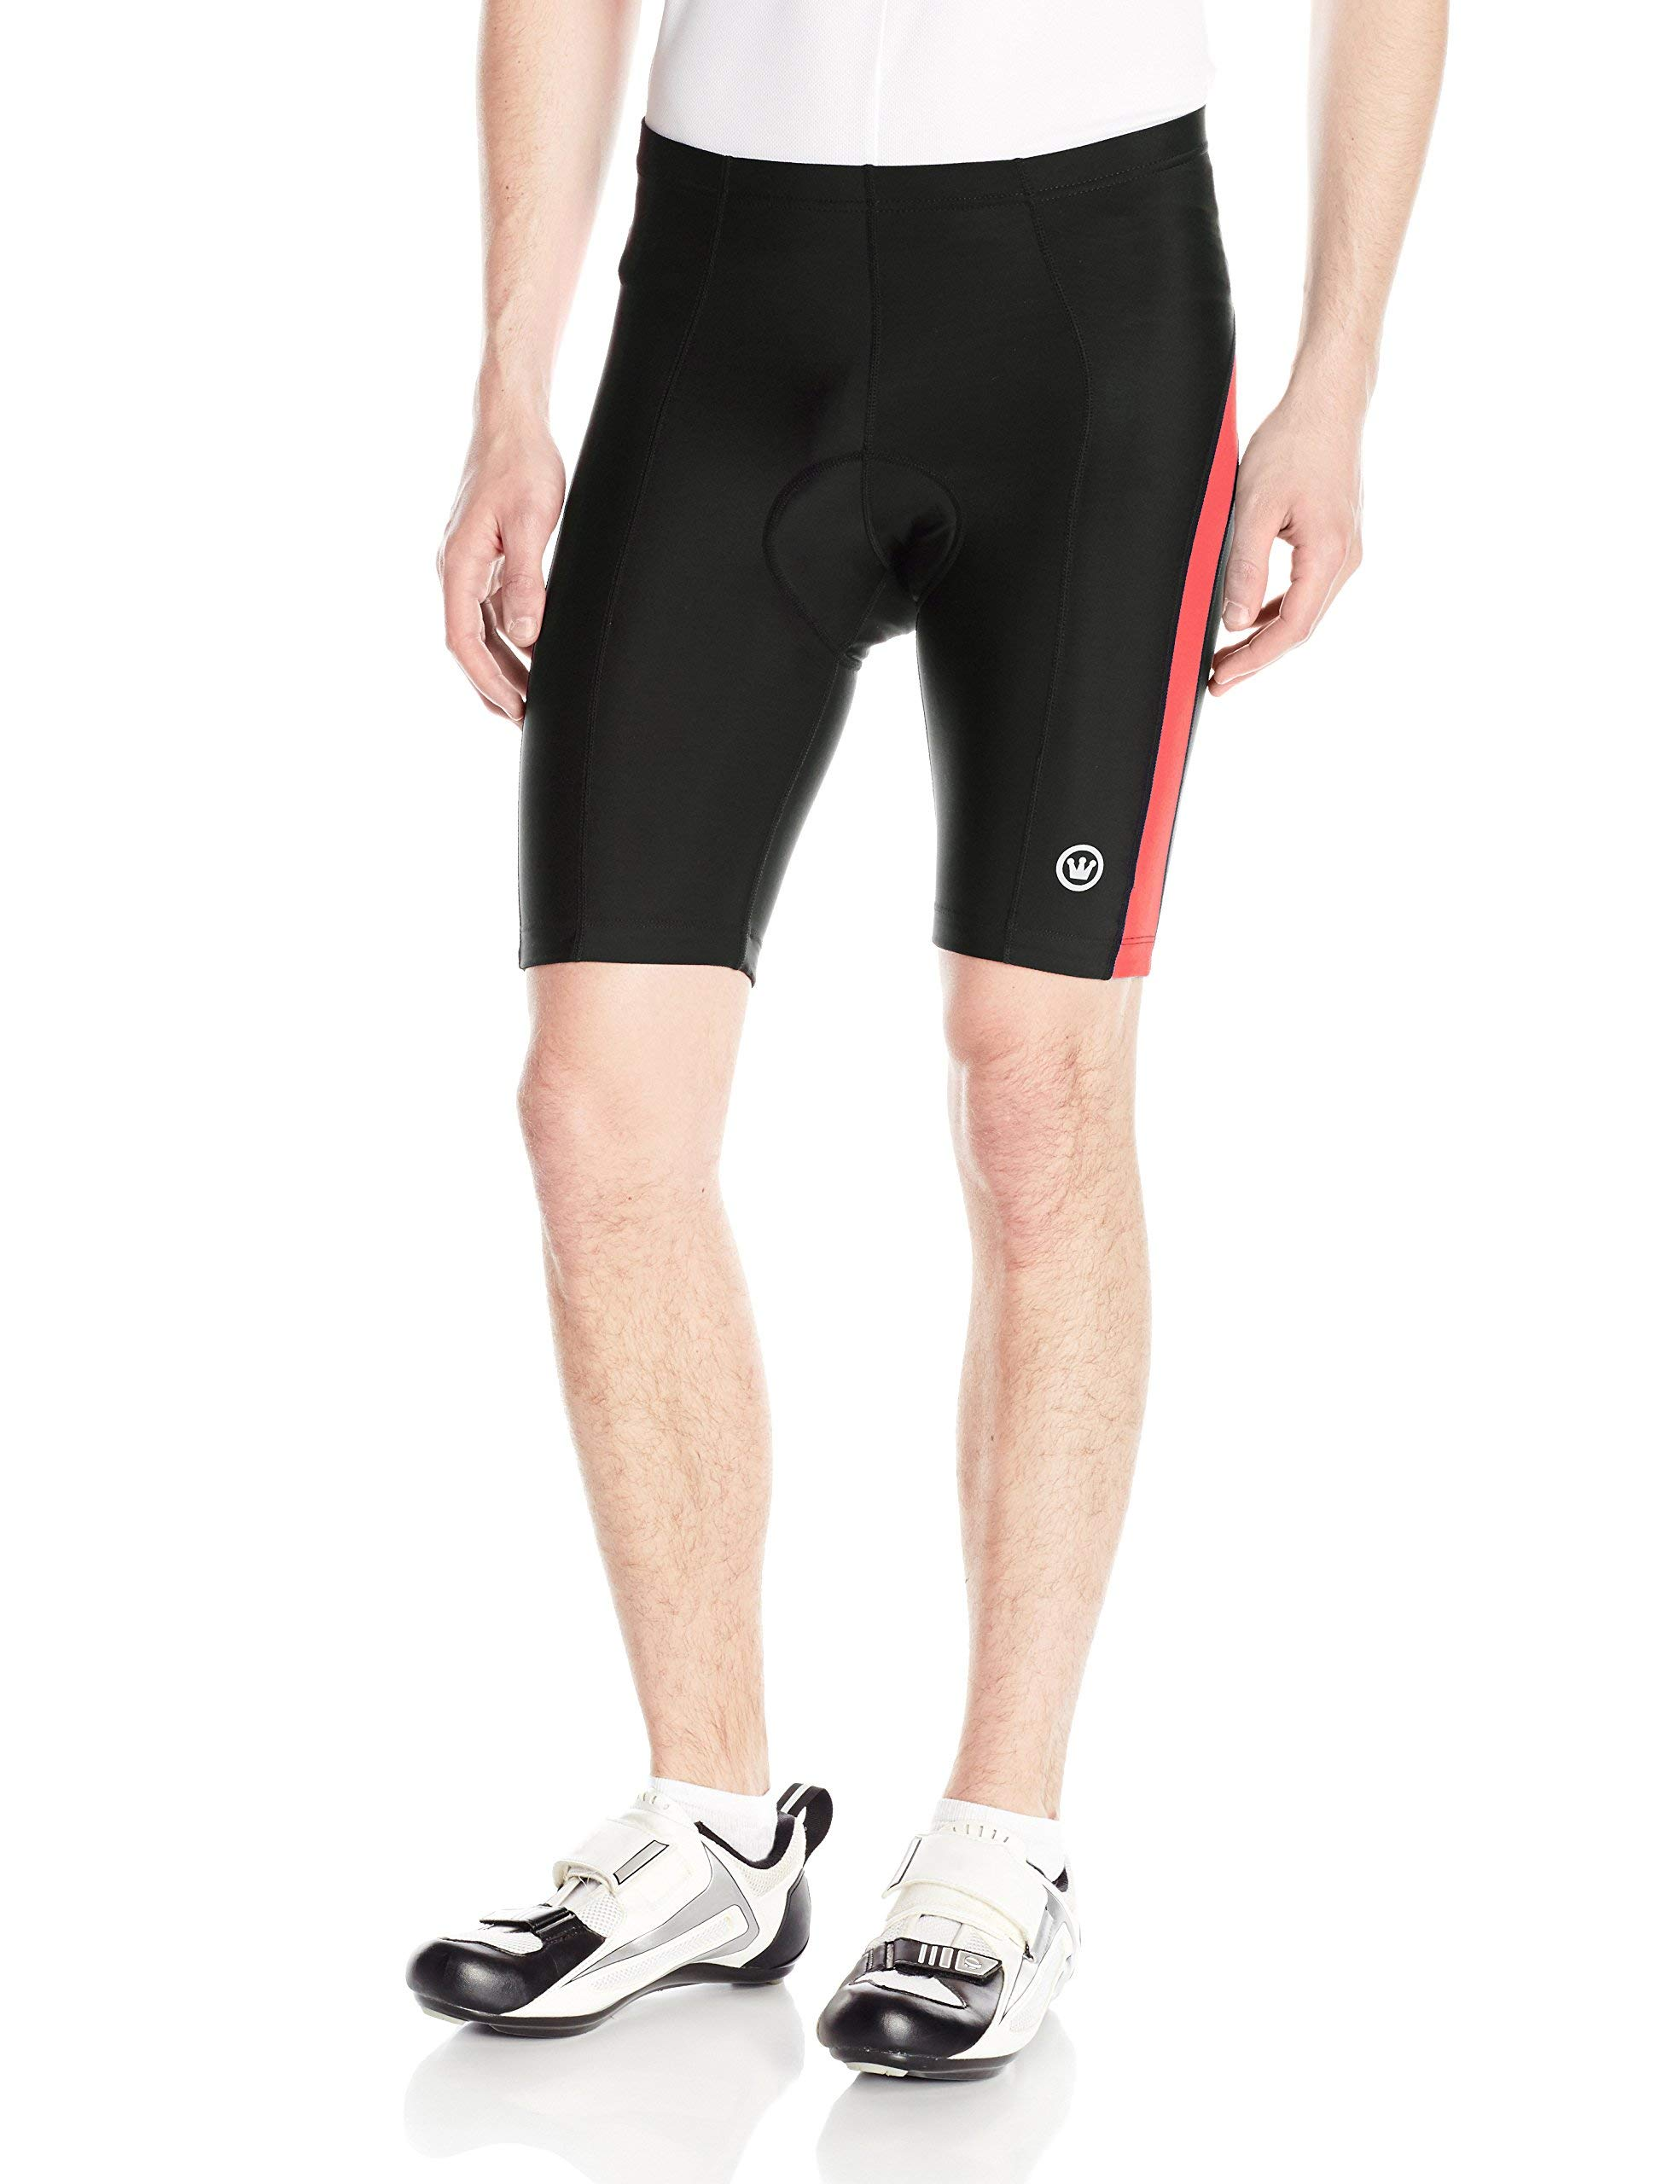 CANARI Men's Blade Gel Shorts, Neon Red Hot, Medium